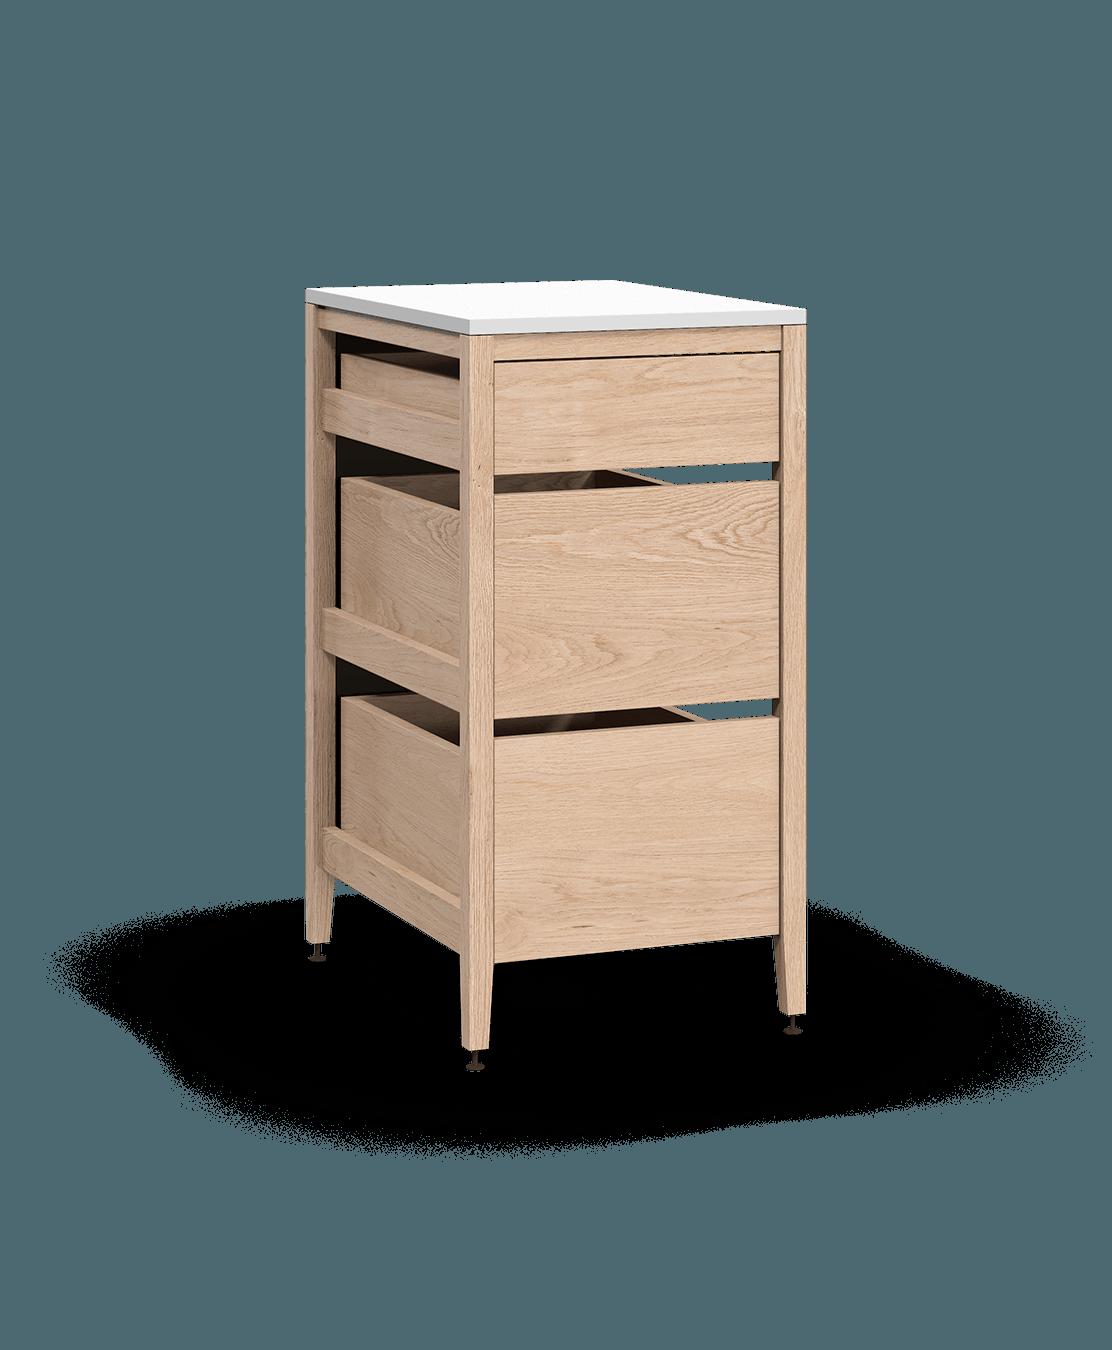 coquo radix white oak solid wood modular 3 drawers base kitchen cabinet 18 inch C1-C-18TB-3001-NA